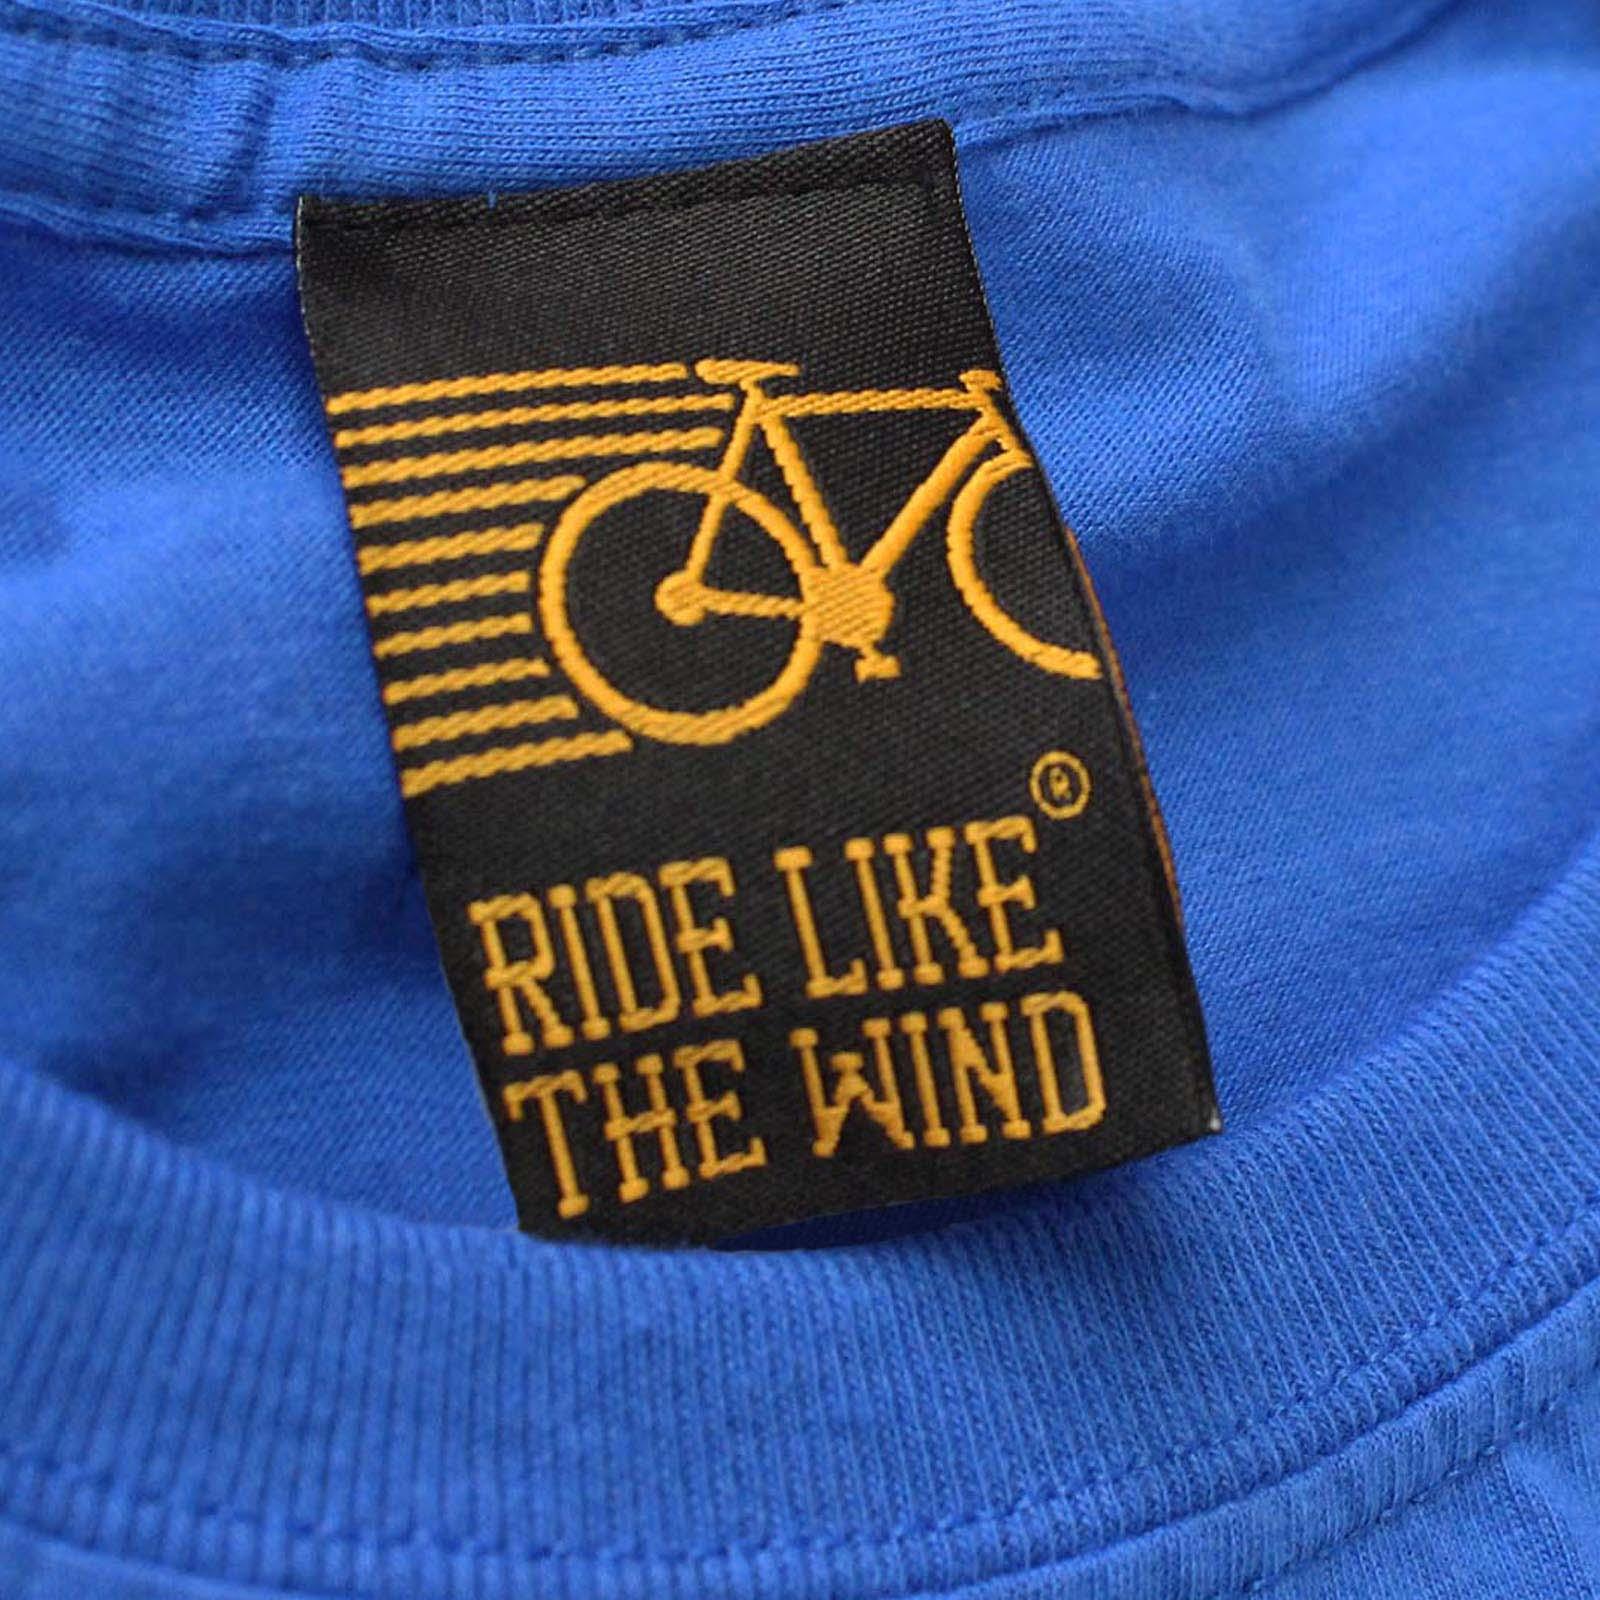 Peace Chain Cycling T-Shirt Funny Novelty Mens tee TShirt